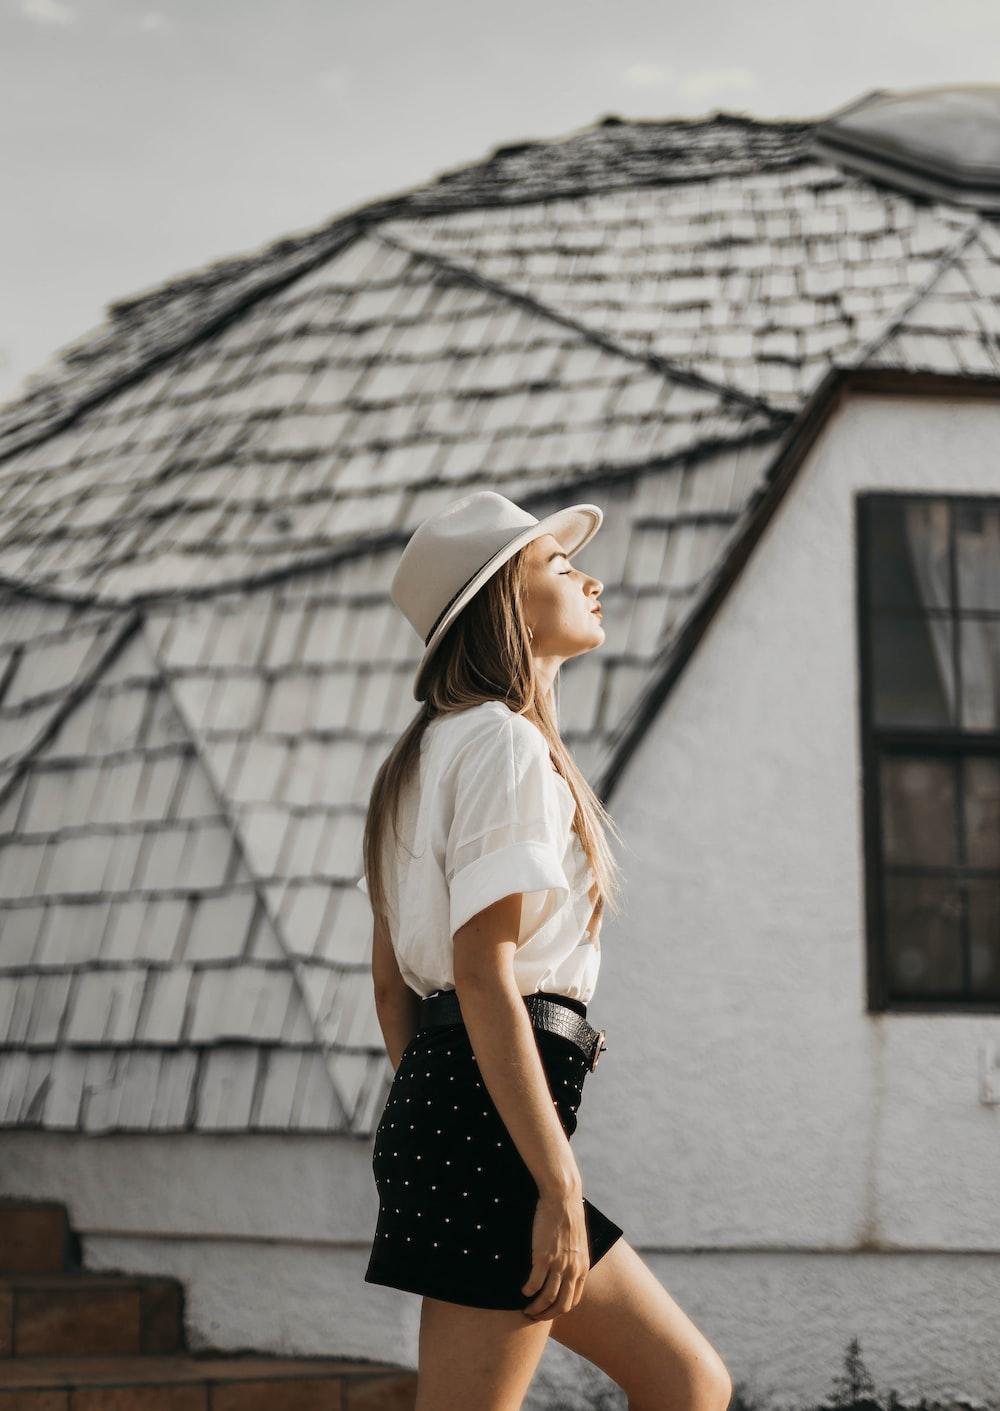 woman wearing white hat